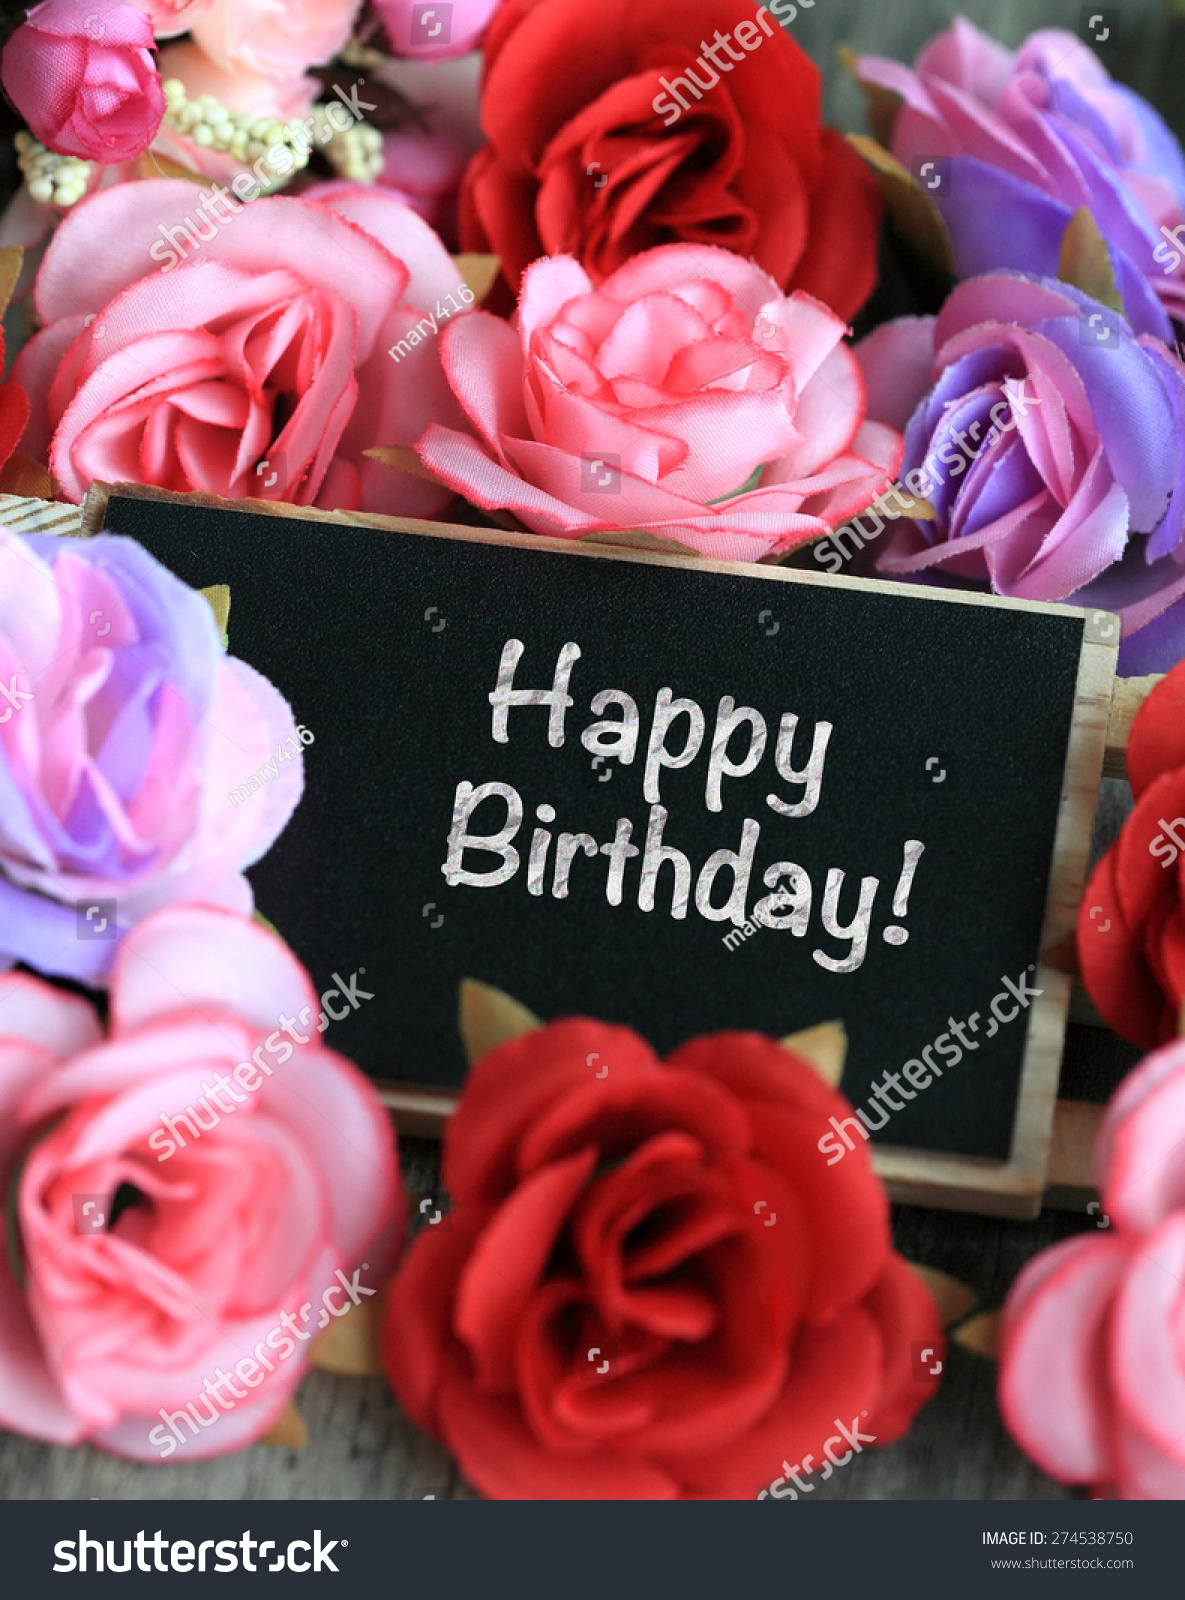 Birthday wishes flowers background stock photo edit now 274538750 birthday wishes with flowers in the background izmirmasajfo